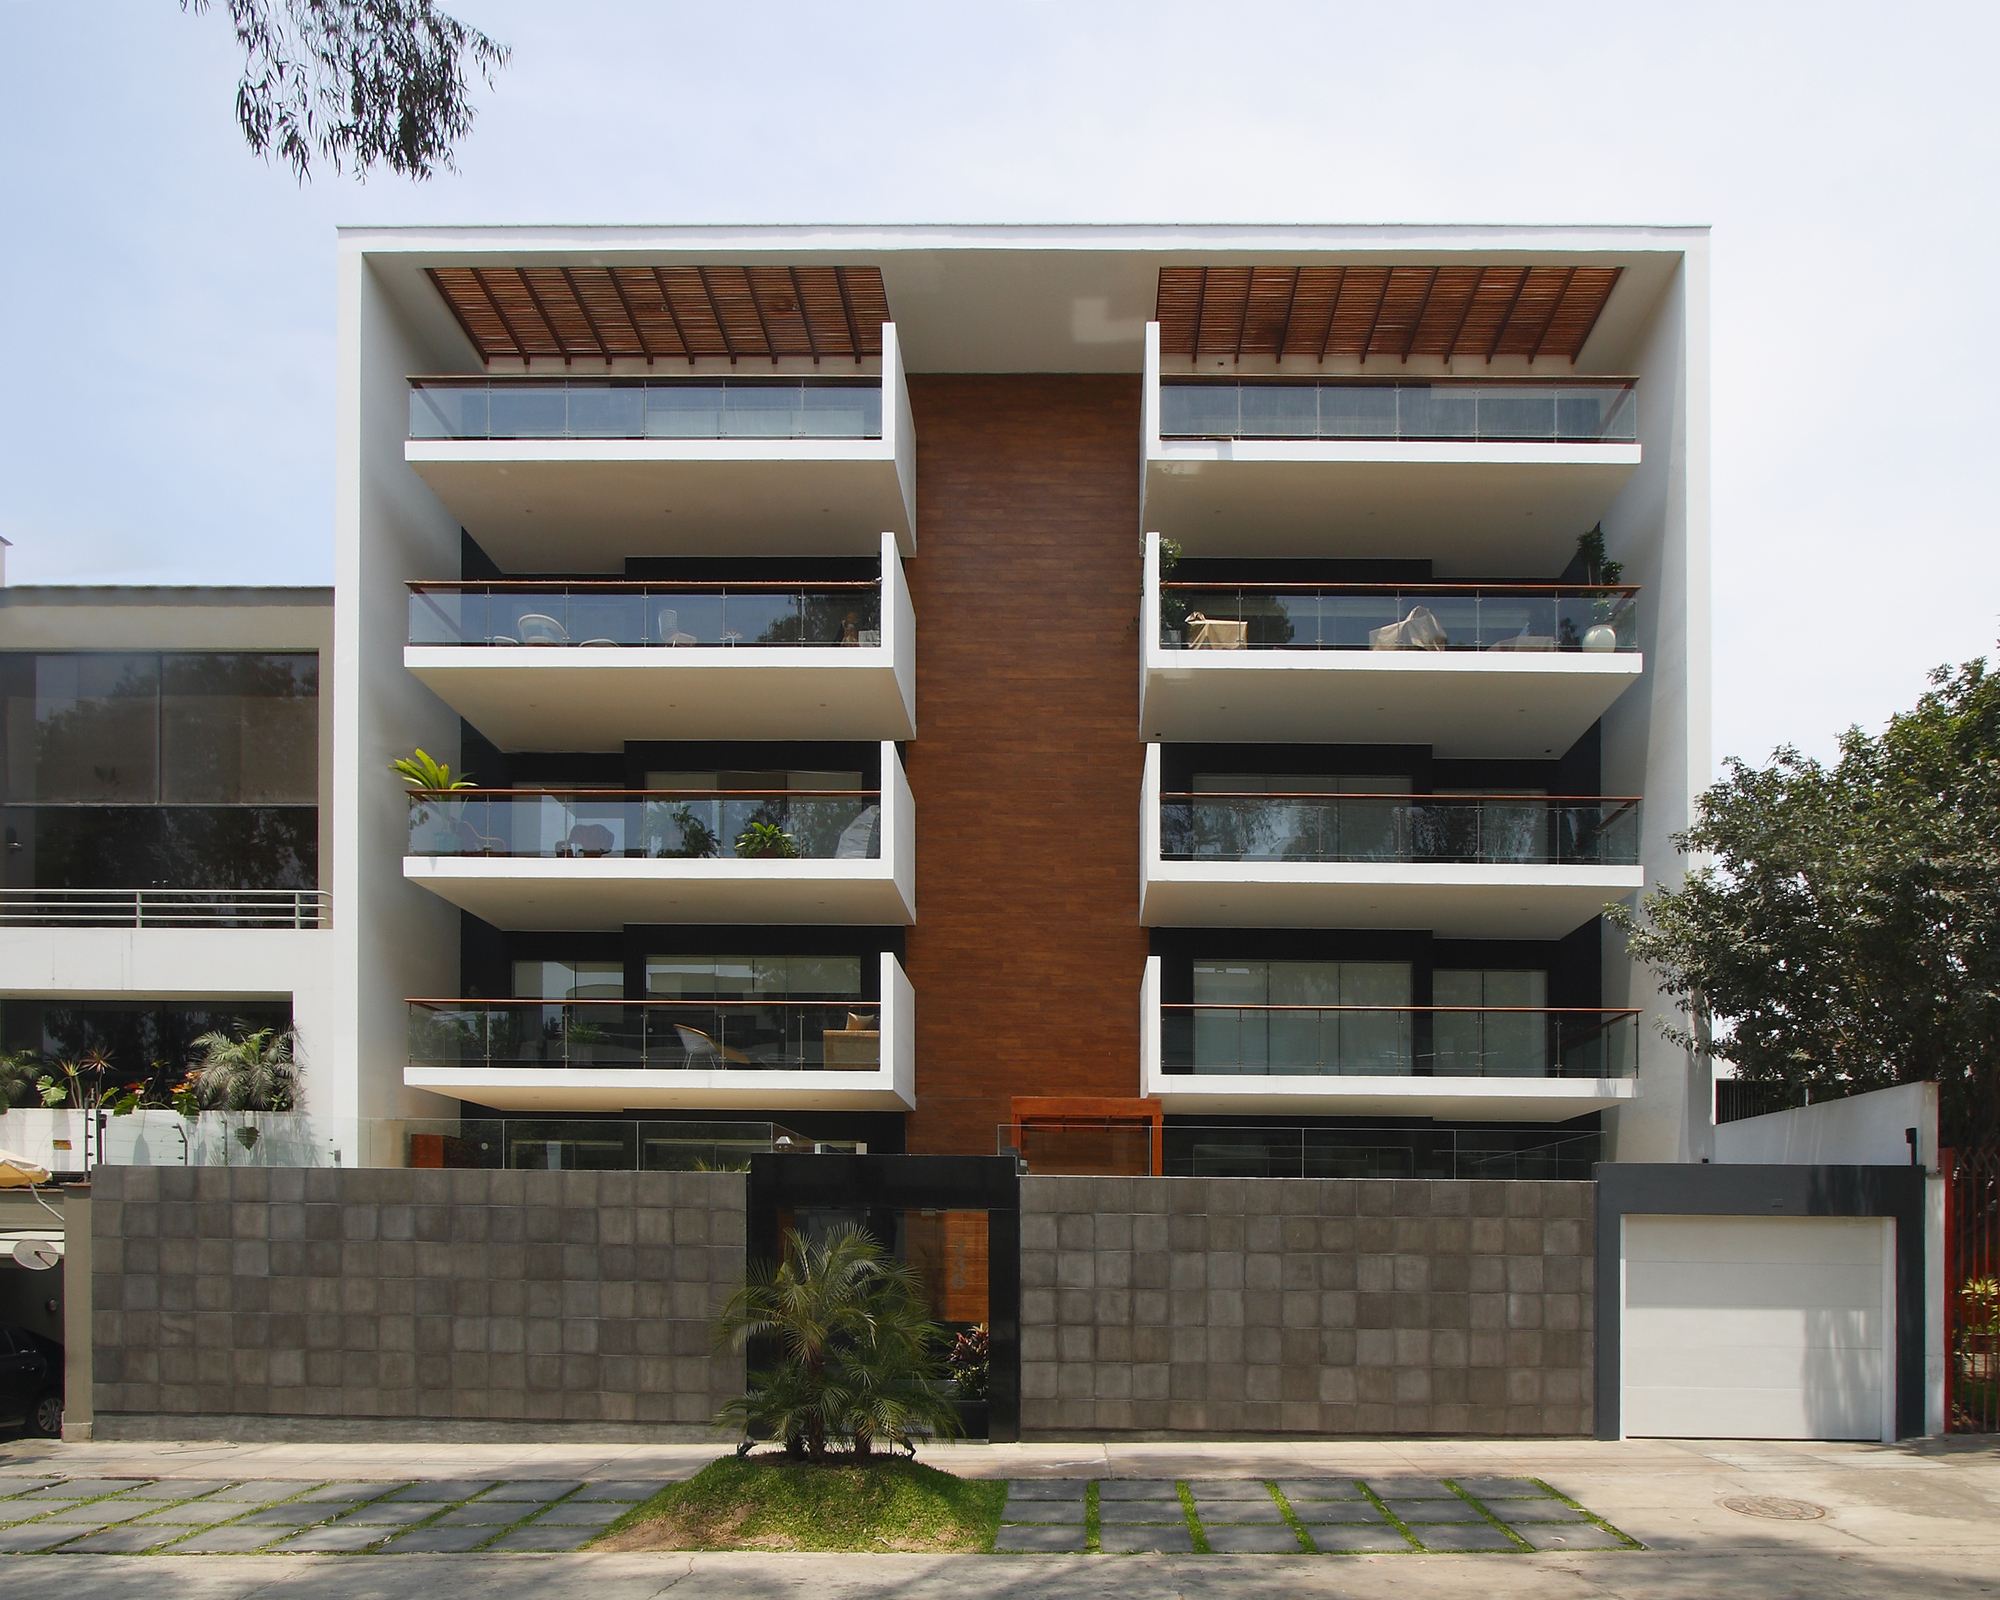 Edificio Del Sur Rubio Arquitectos Plataforma Arquitectura